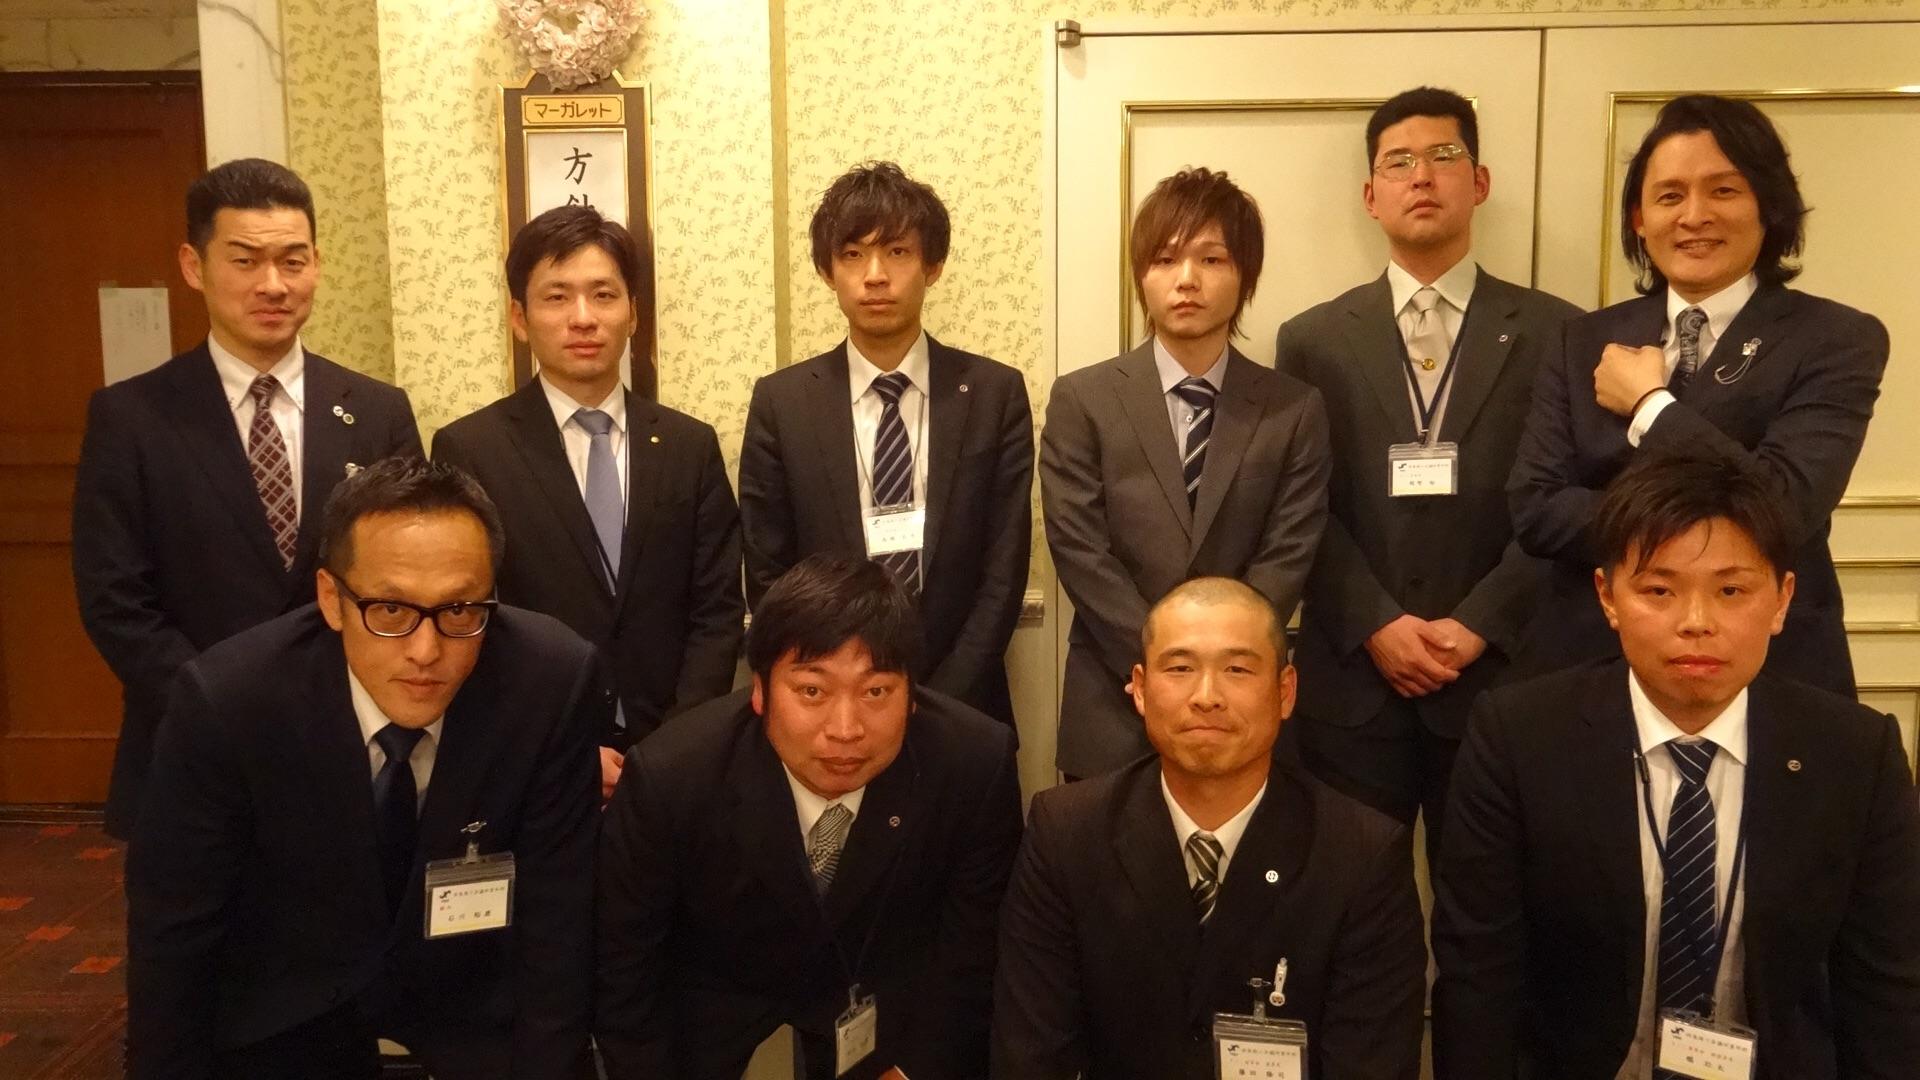 f:id:masanori-kato1972:20190329152346j:image